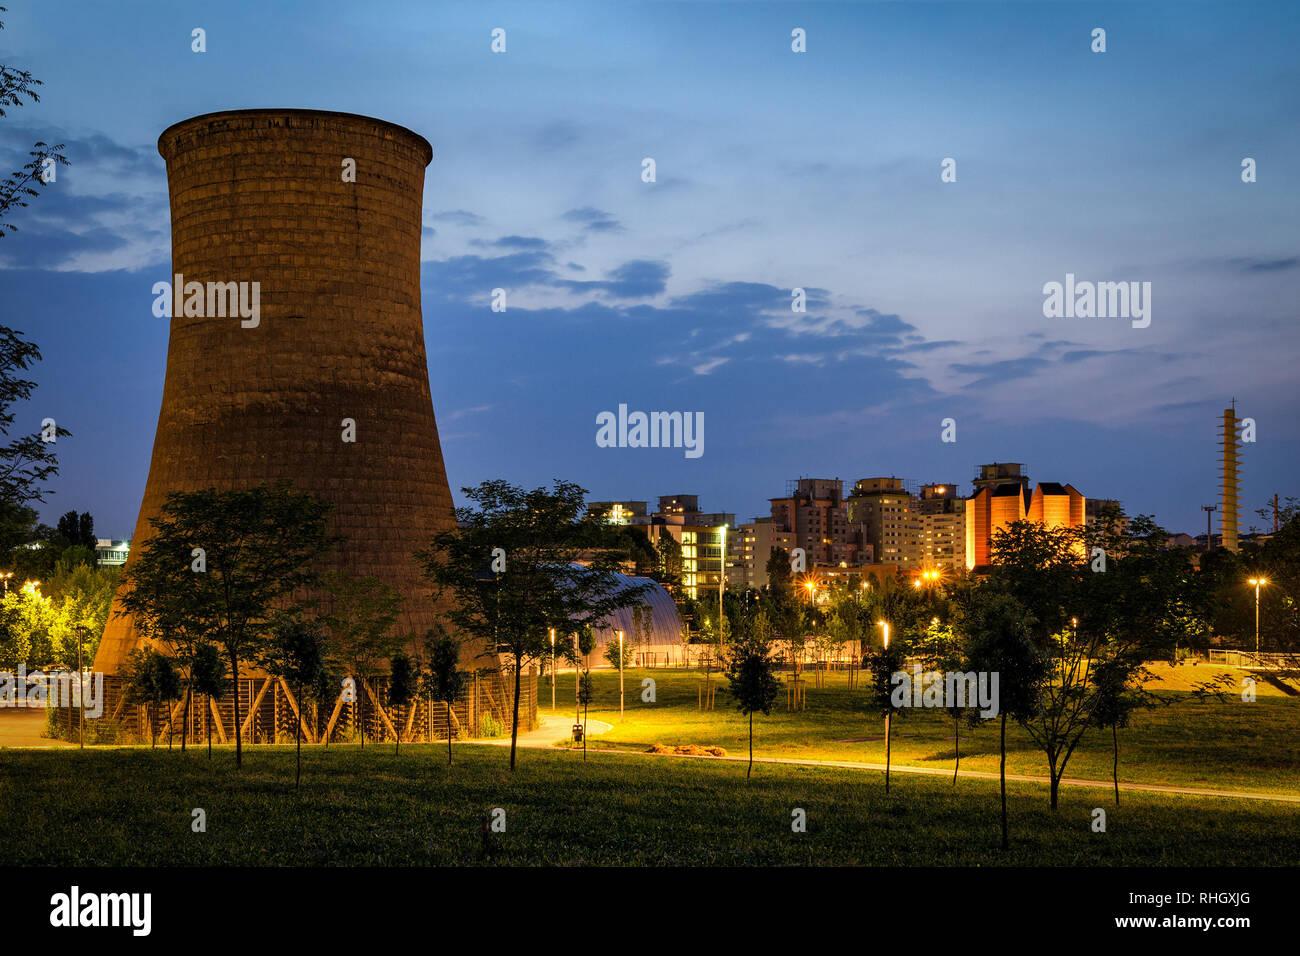 Turín (Torino) Parco Dora con la antigua torre de enfriamiento de la planta de Michelin Foto de stock